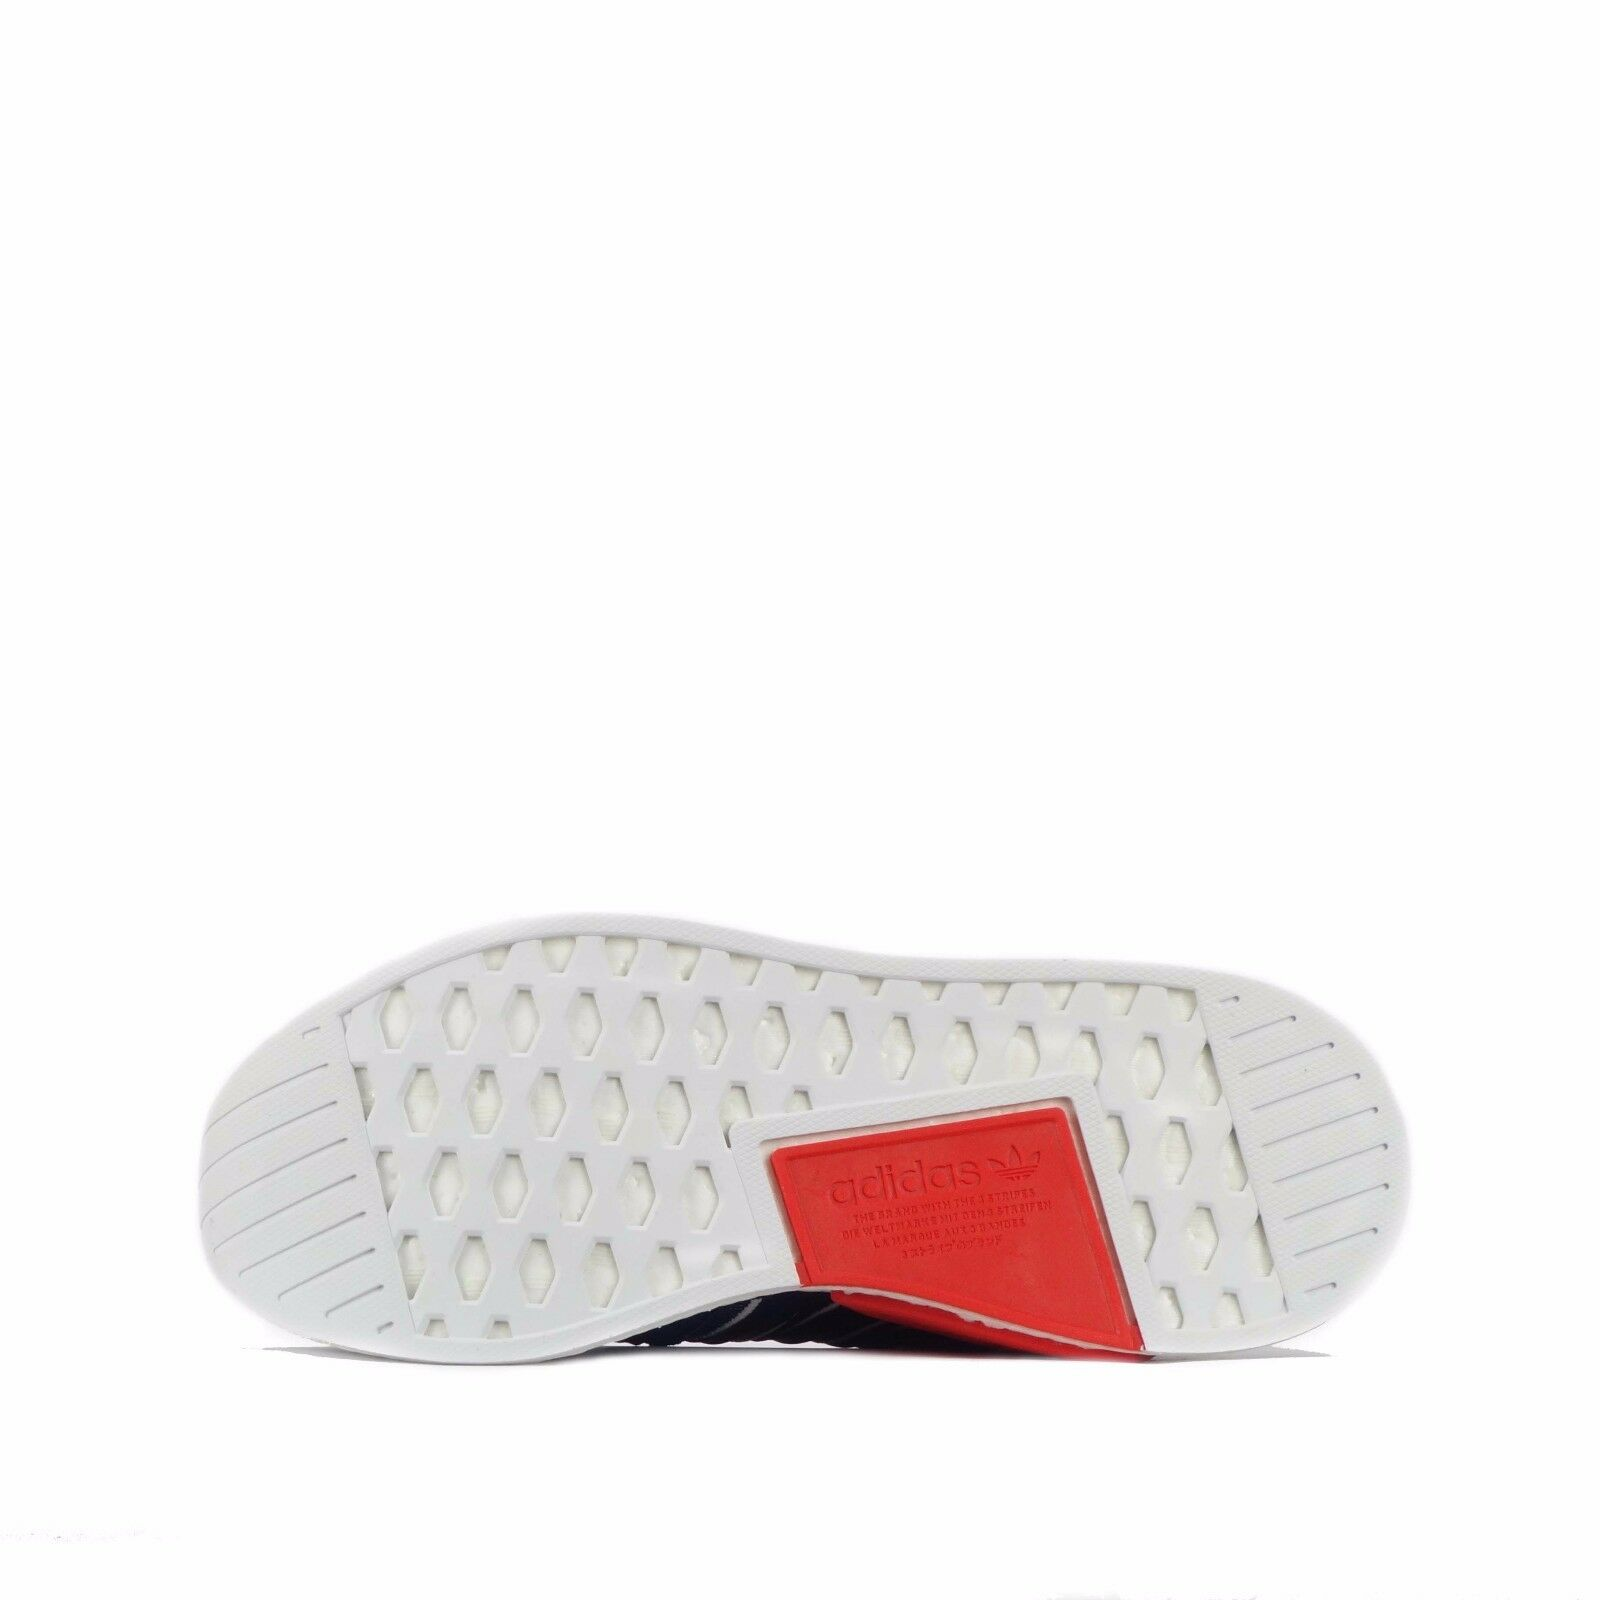 Adidas NMD_R2 HERREN SCHUHE SCHUHE SCHUHE MARINEBLAU weiß ba91b8